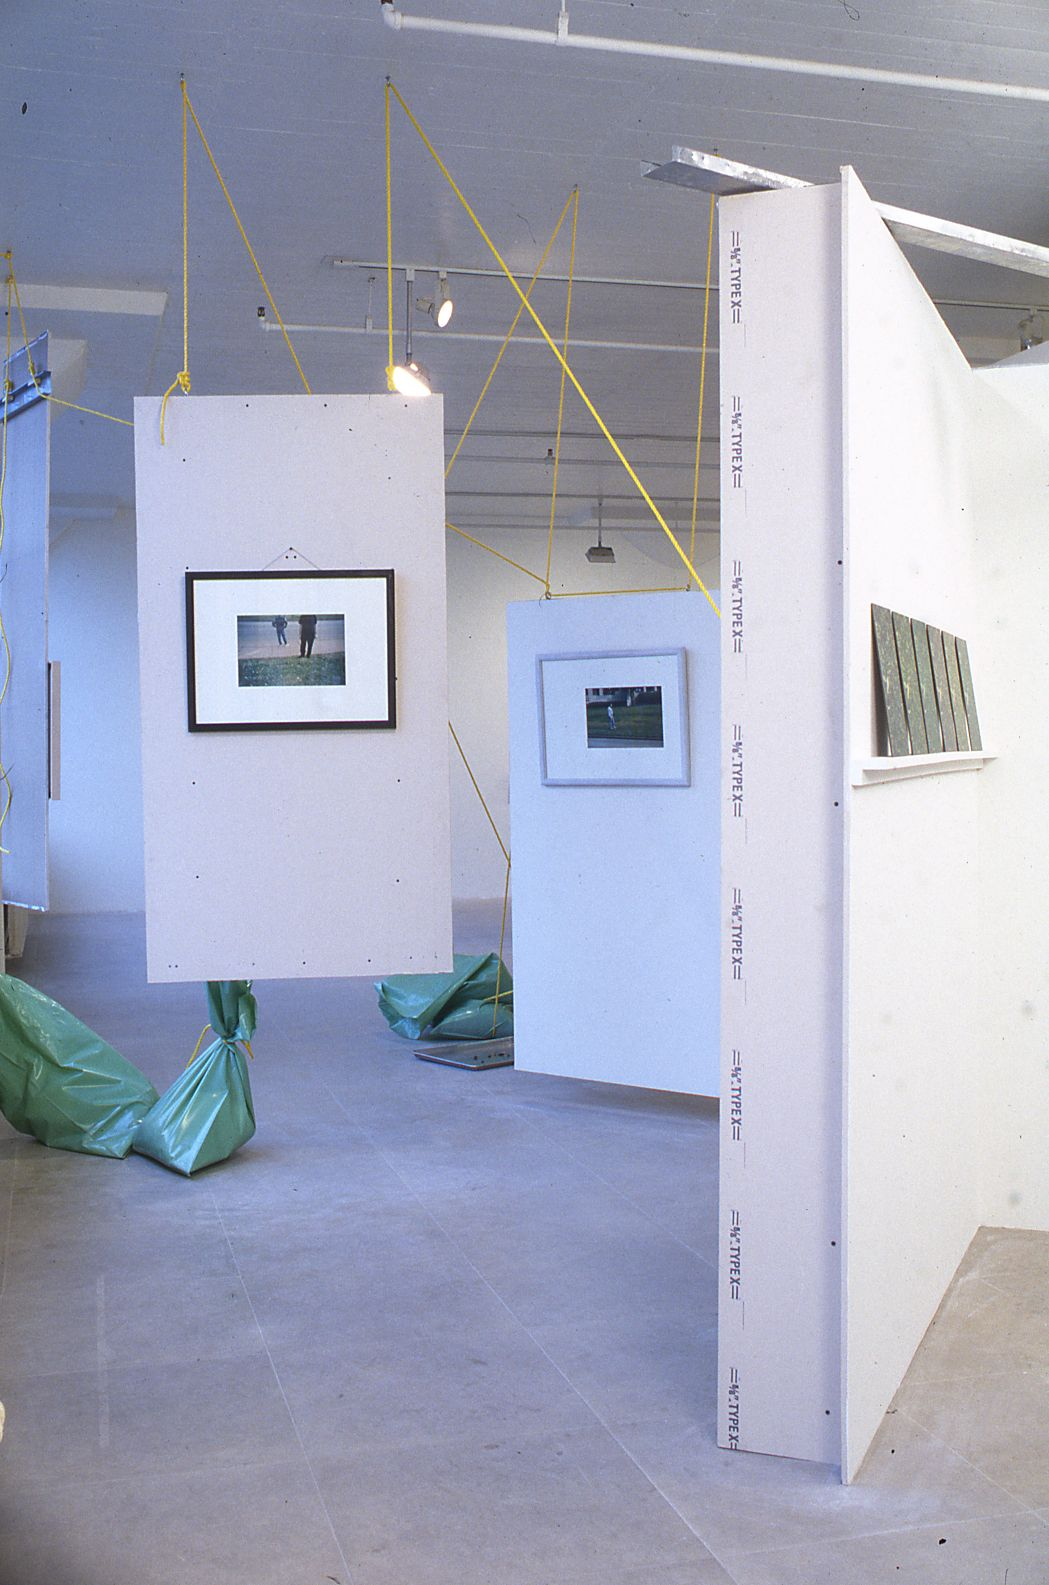 Installation view, Rachel Harrison, Greene Naftali, New York, 1997